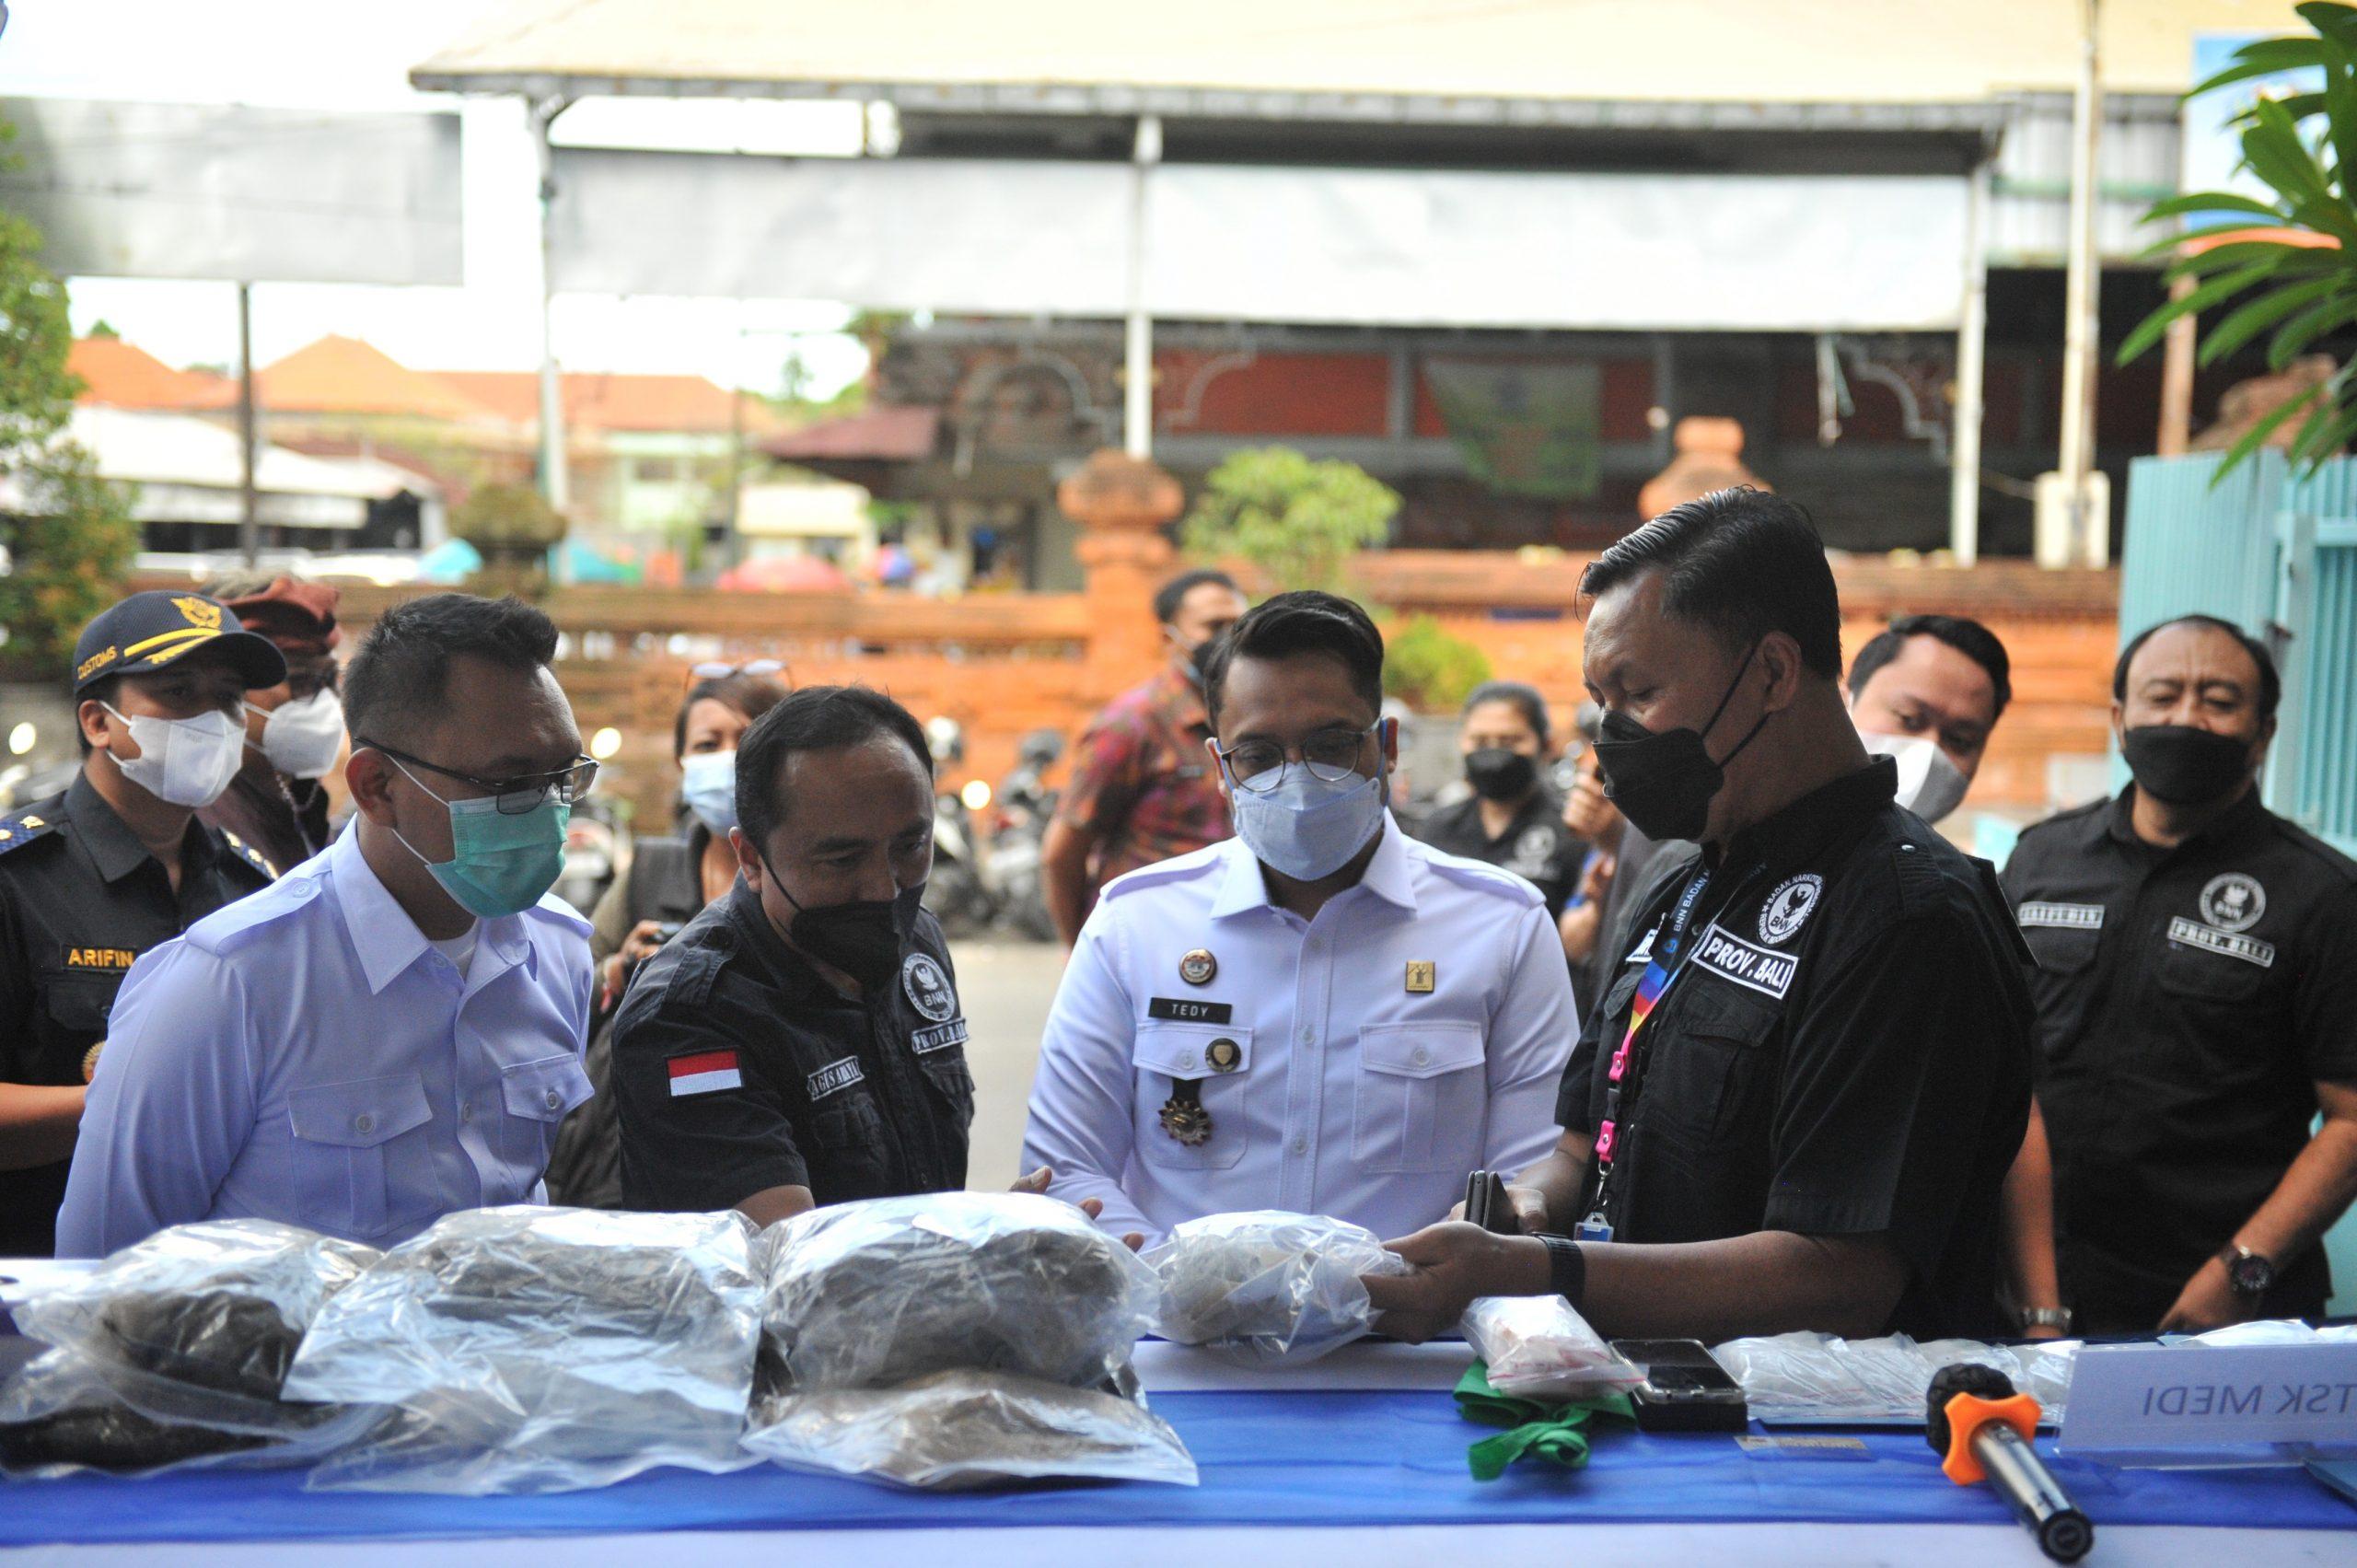 KEPALA BNNP Bali, Brigjen Gede Sugianyar Dwi Putra, menunjukkan barang bukti narkoba yang disita petugas dari tangan tersangka penyalahguna narkoba saat rilis kasus di kantor BNNP Bali, Rabu (13/10/2021). Foto: ist